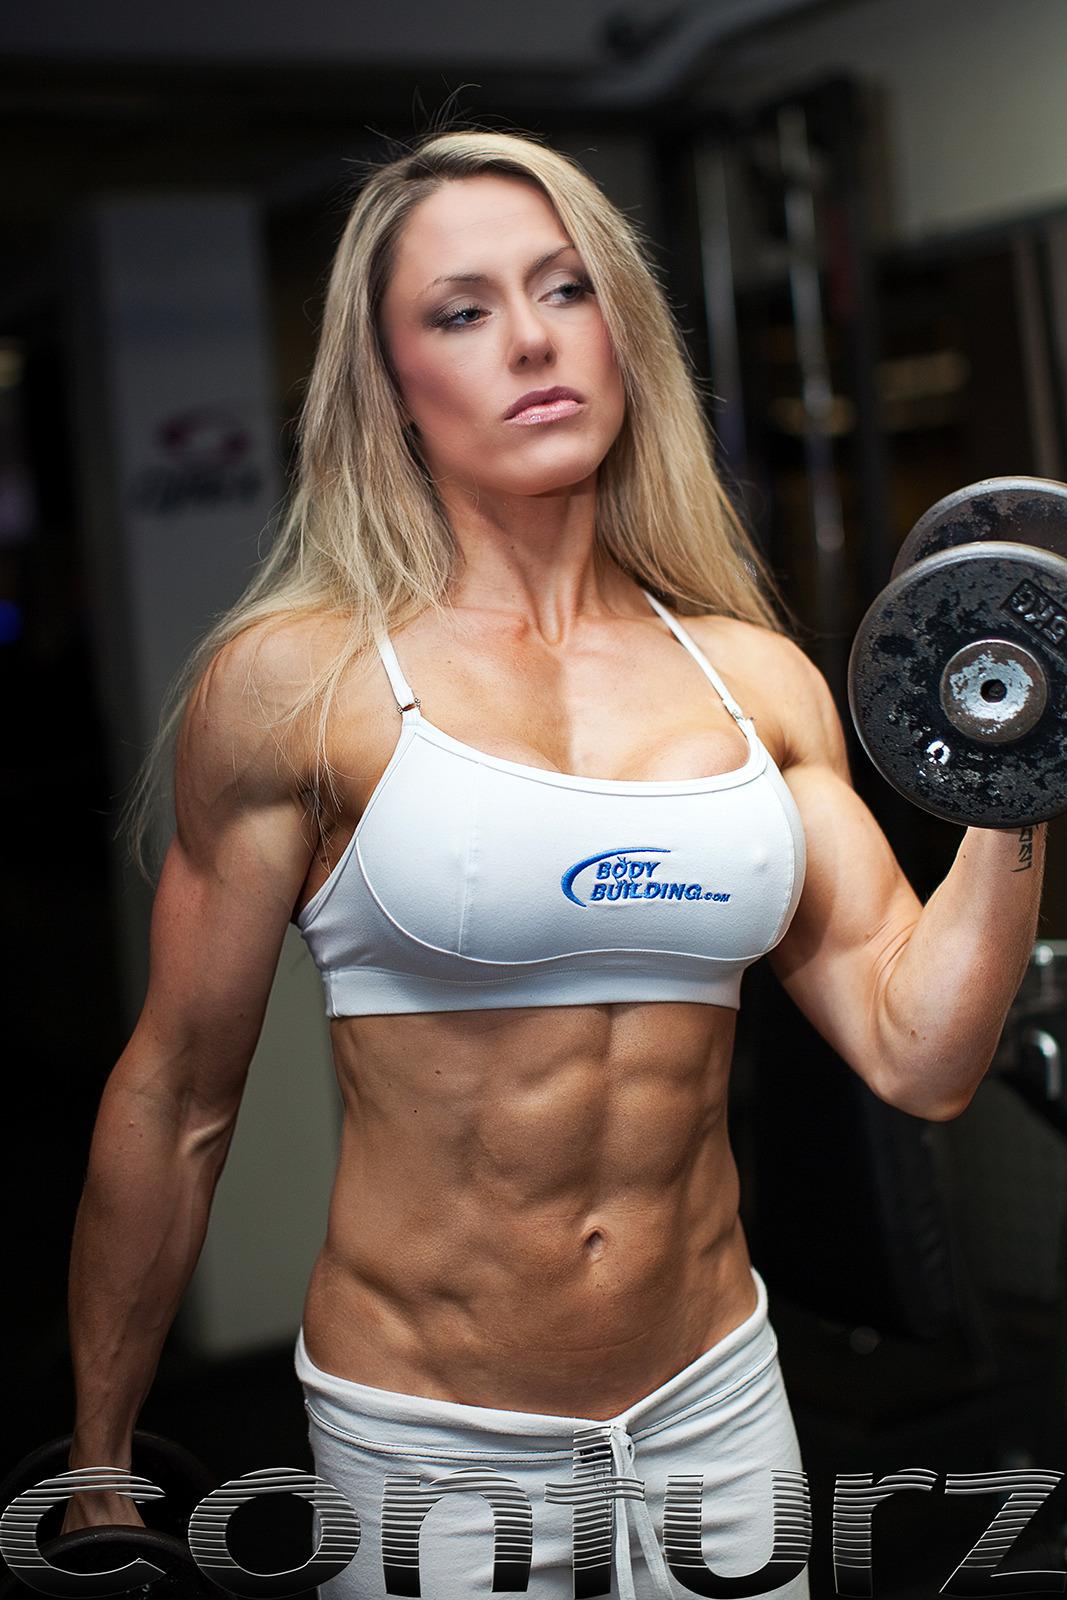 Fitness girl nude — img 12